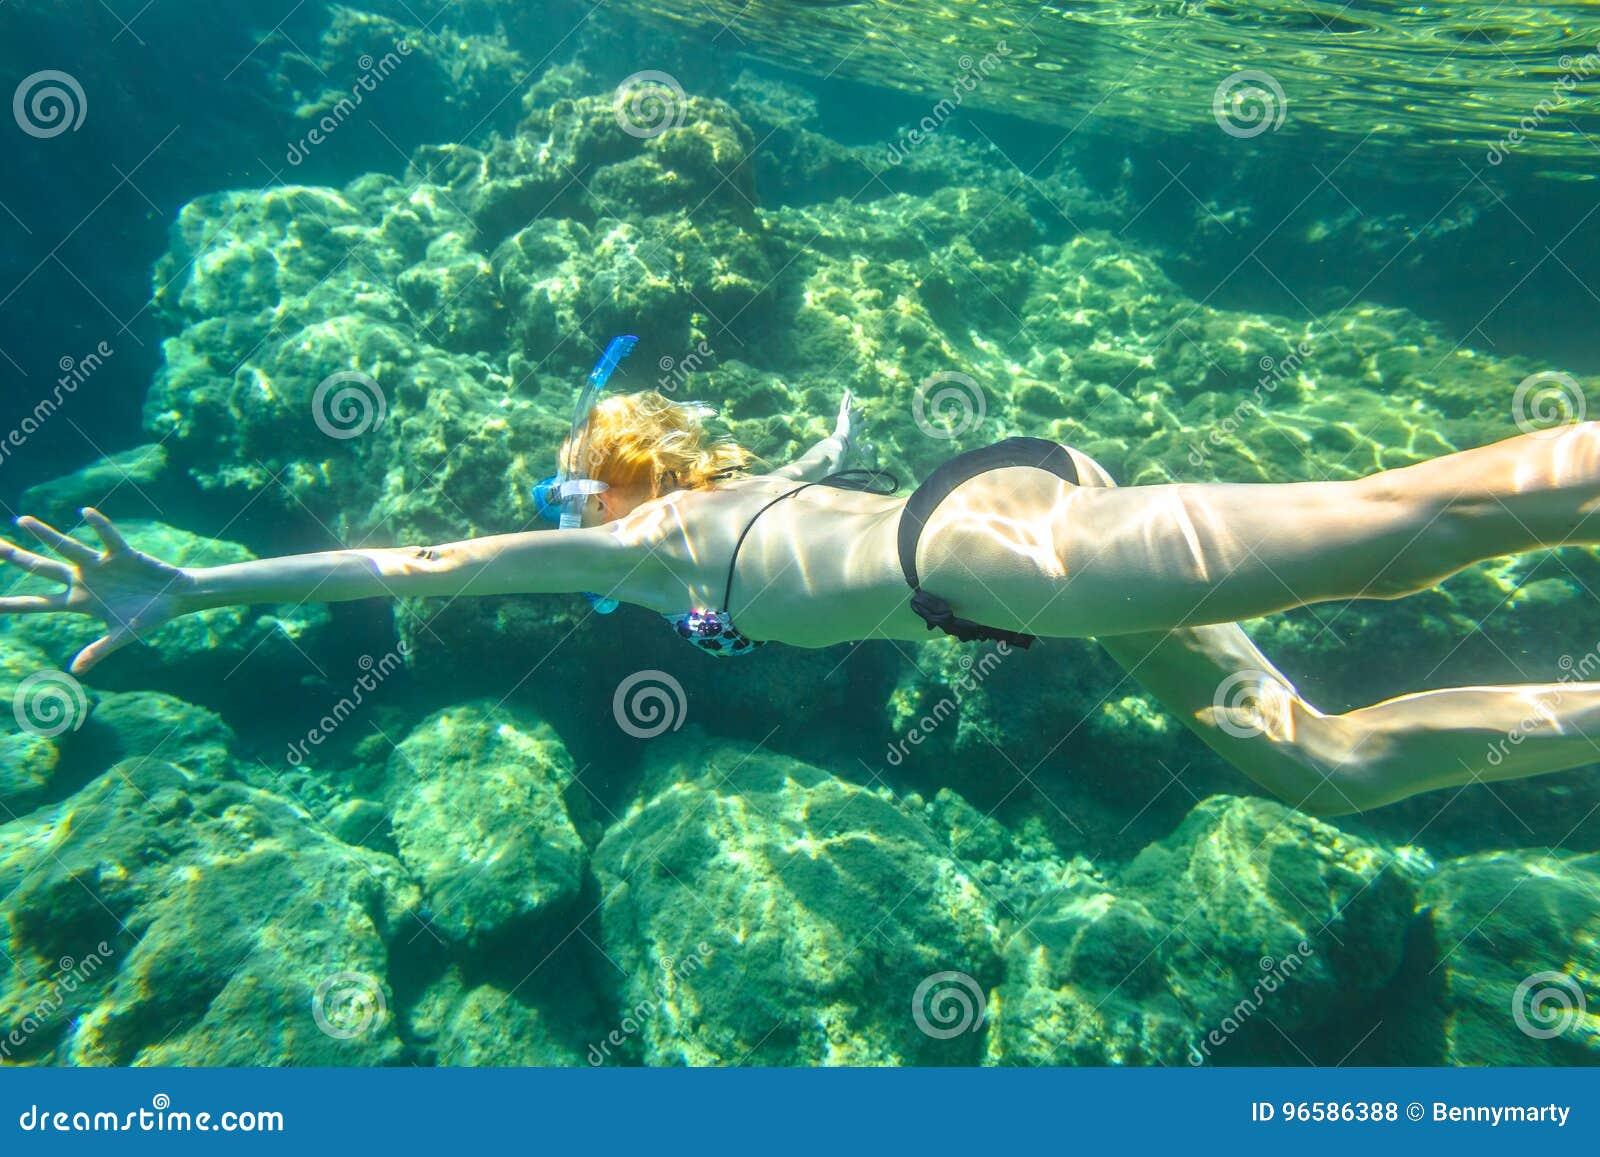 Female apnea underwater stock photo  Image of diver, deep - 96586388